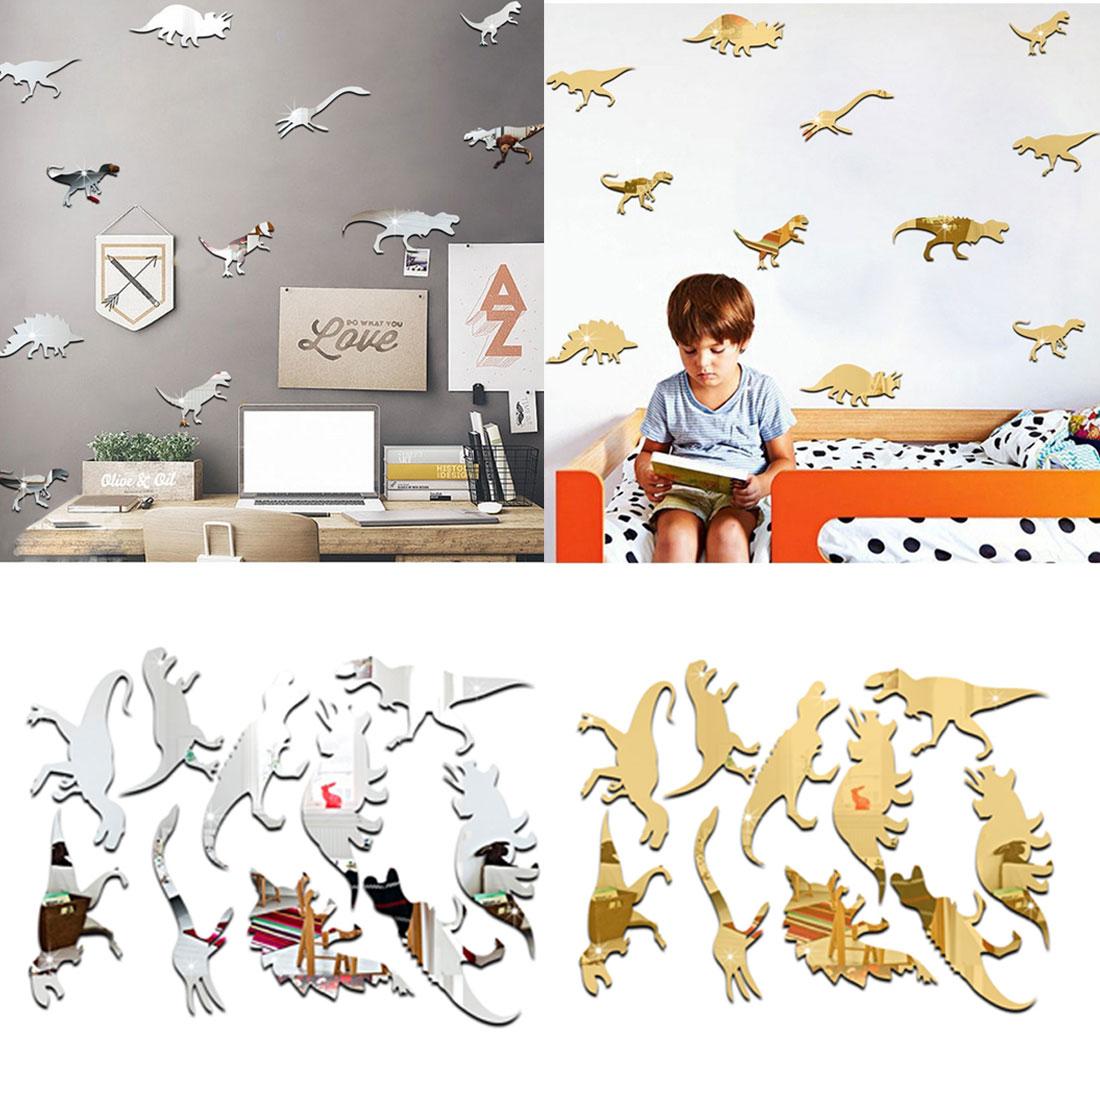 Mirror Surface Cartoon Dinosaur Wall Sticker Children Room Cute Wall Decal Baby Animal Home Decor Vinyl Removable Sticker